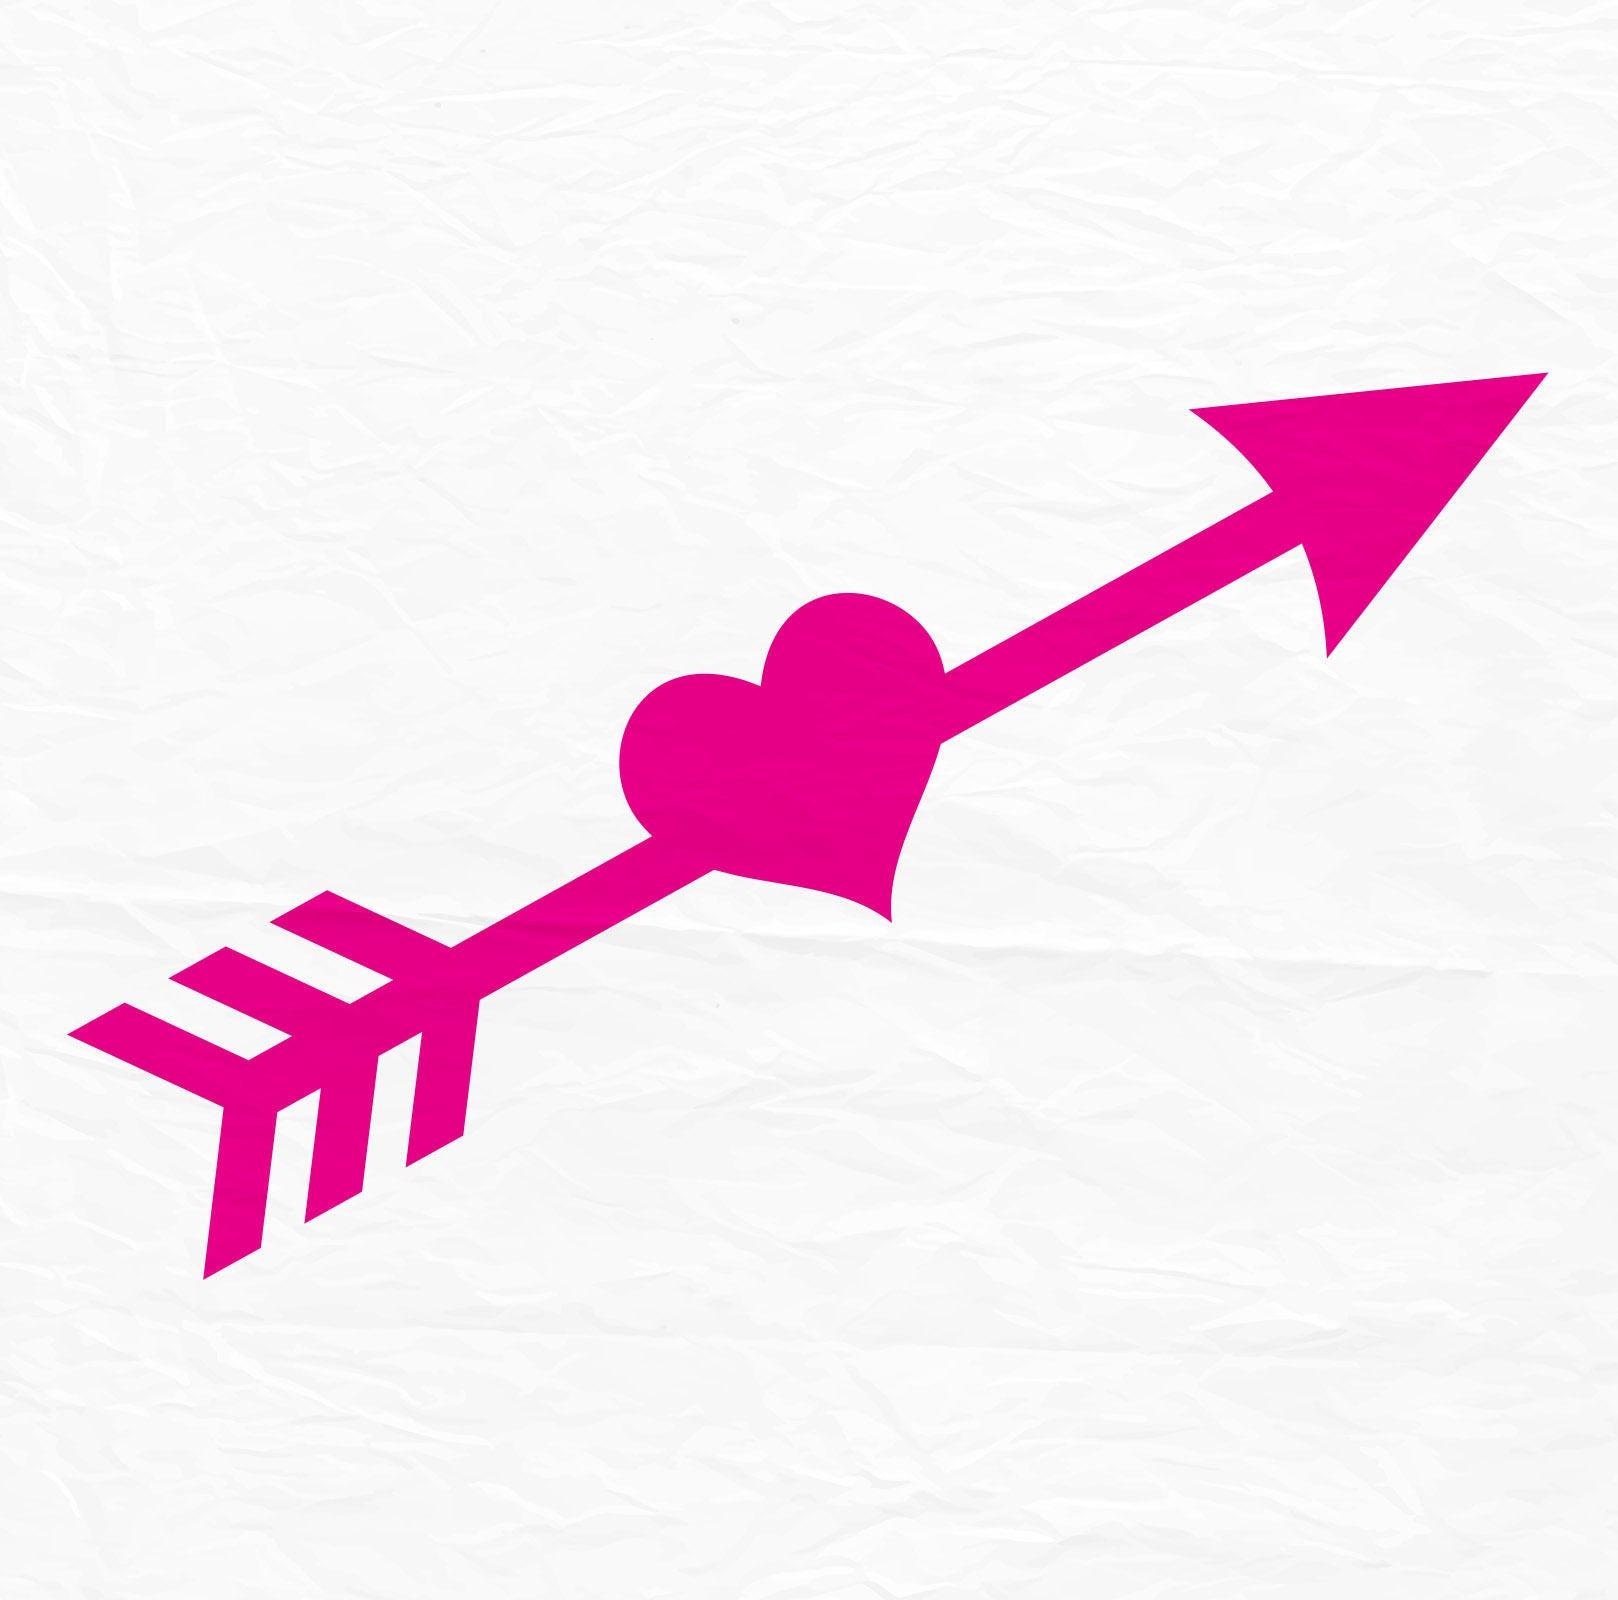 arrow svg arrow heart svg heart svg cupid 39 s equipment etsy. Black Bedroom Furniture Sets. Home Design Ideas